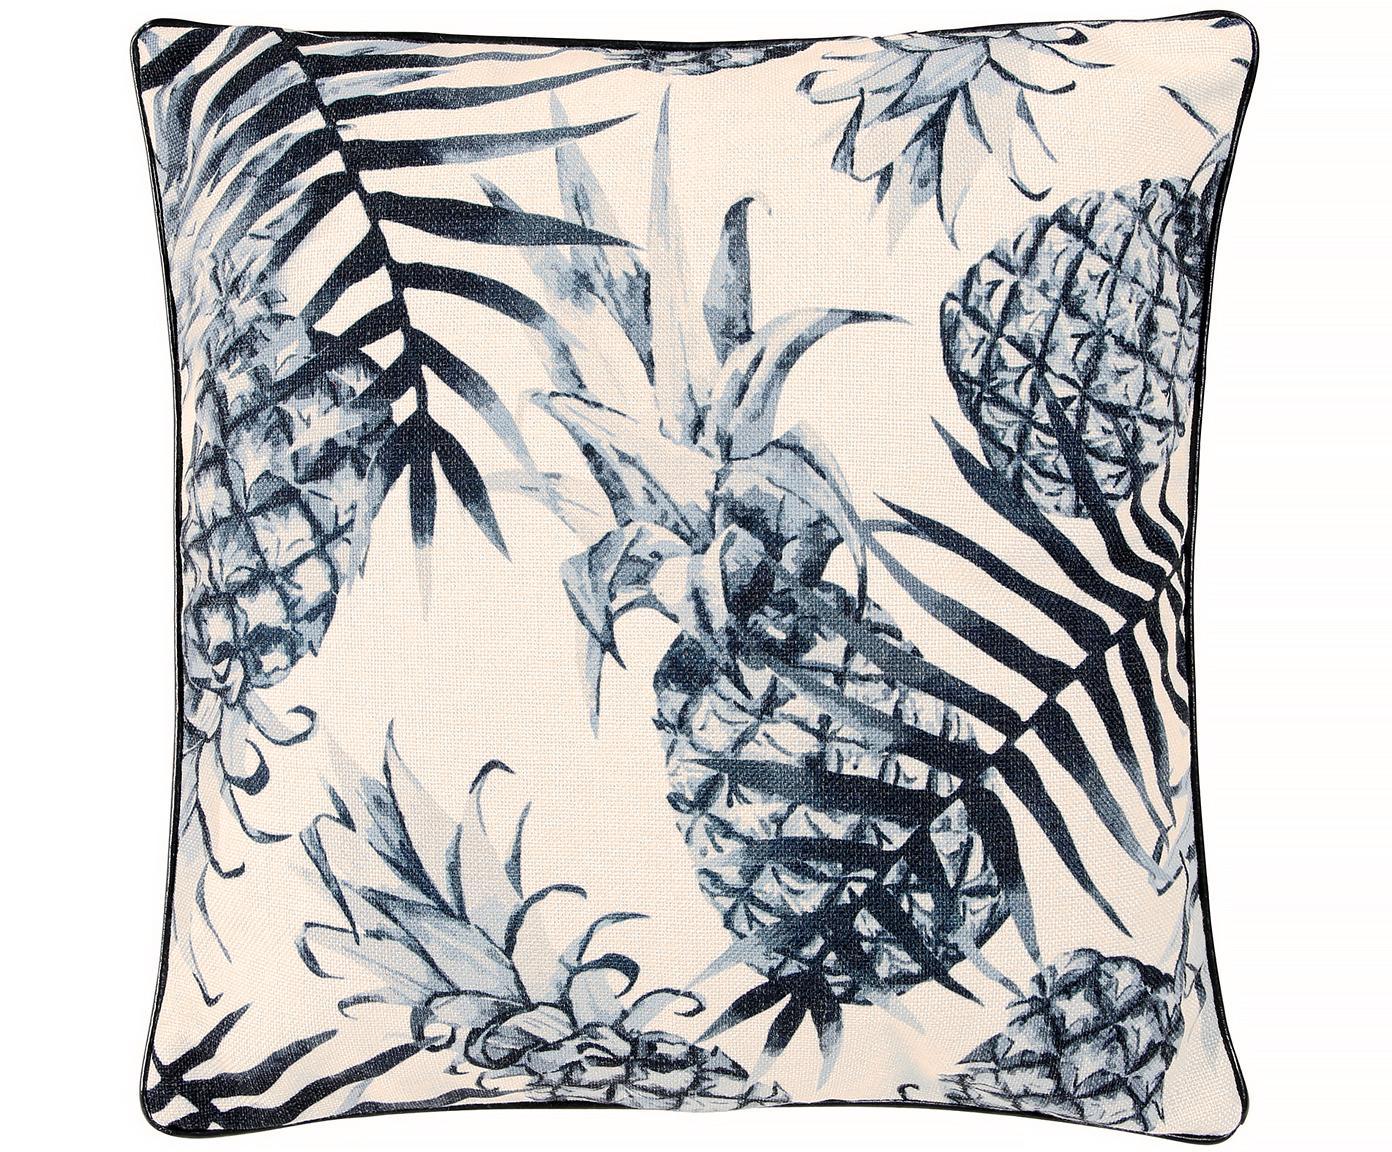 Federa arredo Ananas, Fronte: grigio blu, beige chiaro, nero Retro: beige chiaro Bordatura: nero, Larg. 45 x Lung. 45 cm